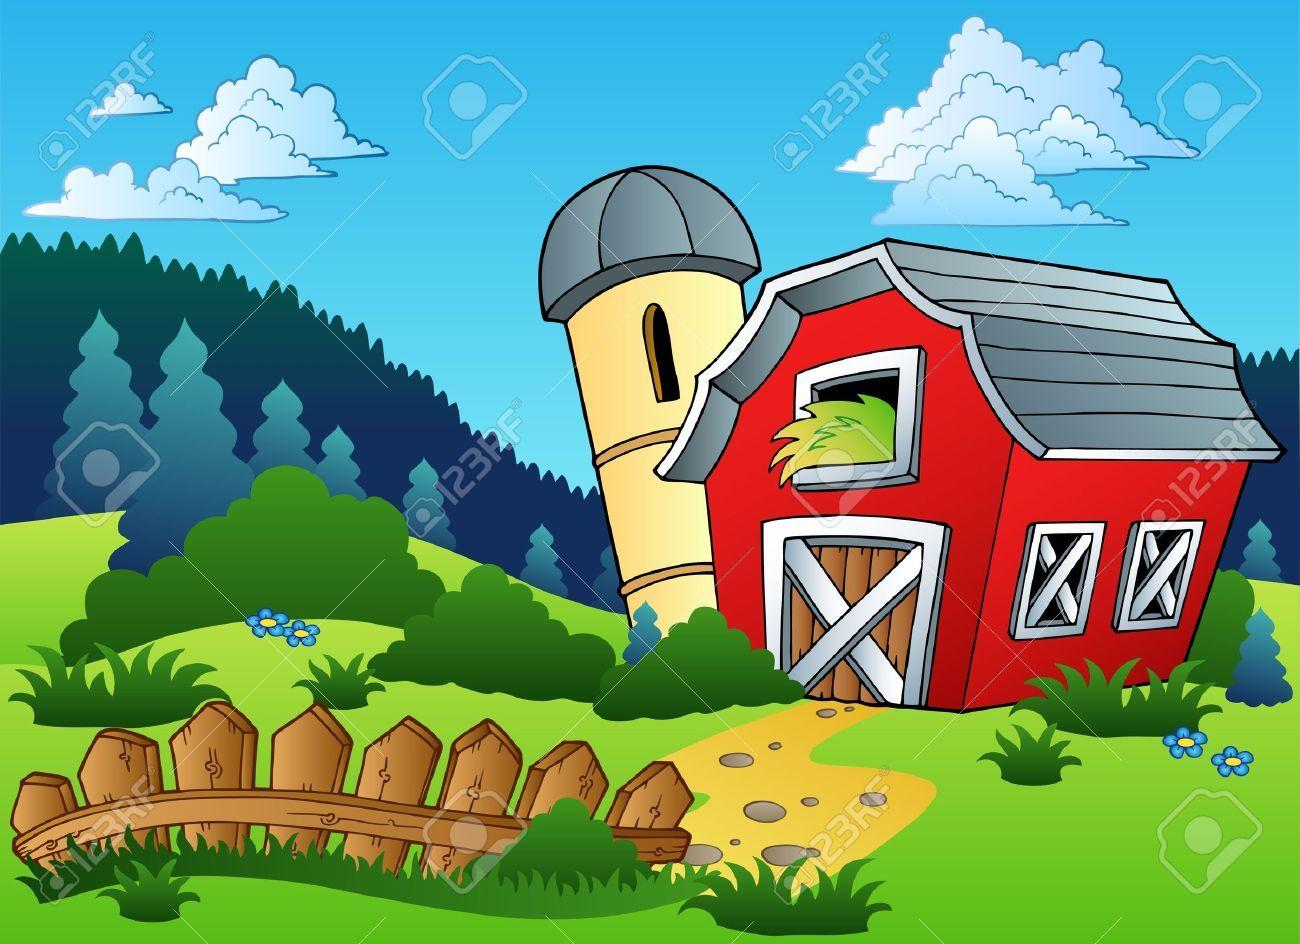 Resultado de imagen para. Farmhouse clipart farm landscape